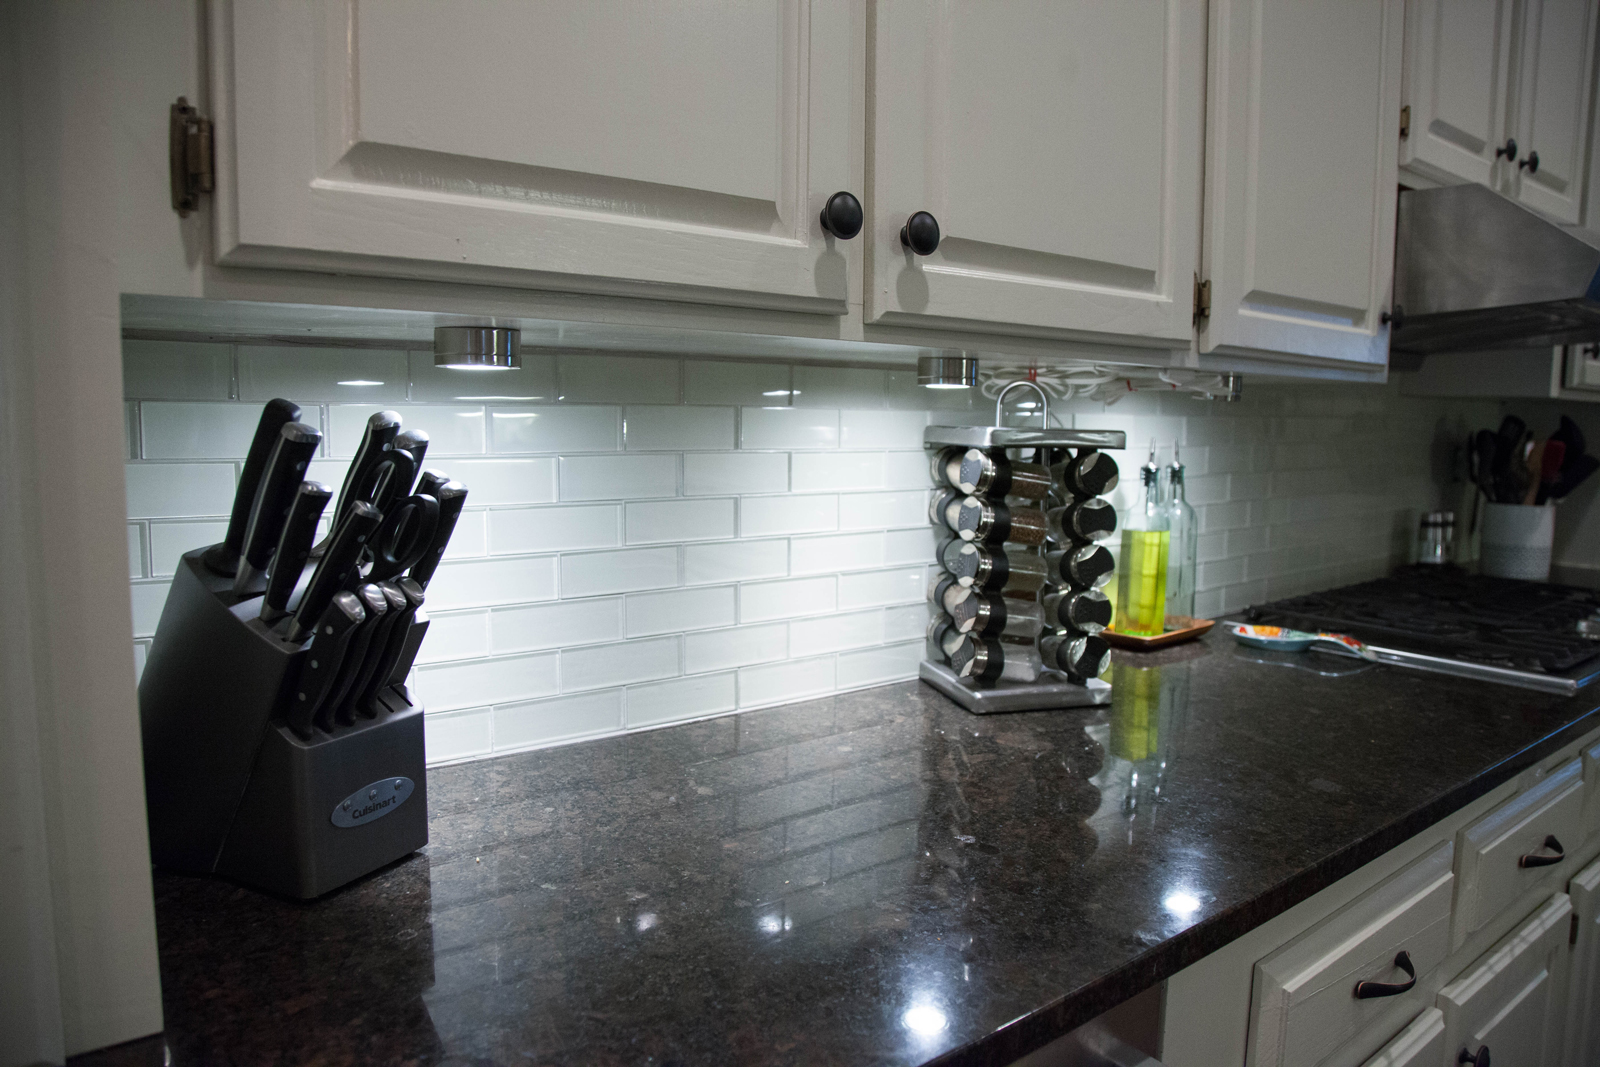 Wonderful 12X12 Acoustic Ceiling Tiles Huge 18 Ceramic Tile Regular 2X2 Ceiling Tiles 2X4 Tile Backsplash Youthful 3X6 Glass Subway Tile Backsplash Red6 Inch Floor Tiles Subway Glass Tile   Mosaics Come In 2X4 And 3X6   South Cypress